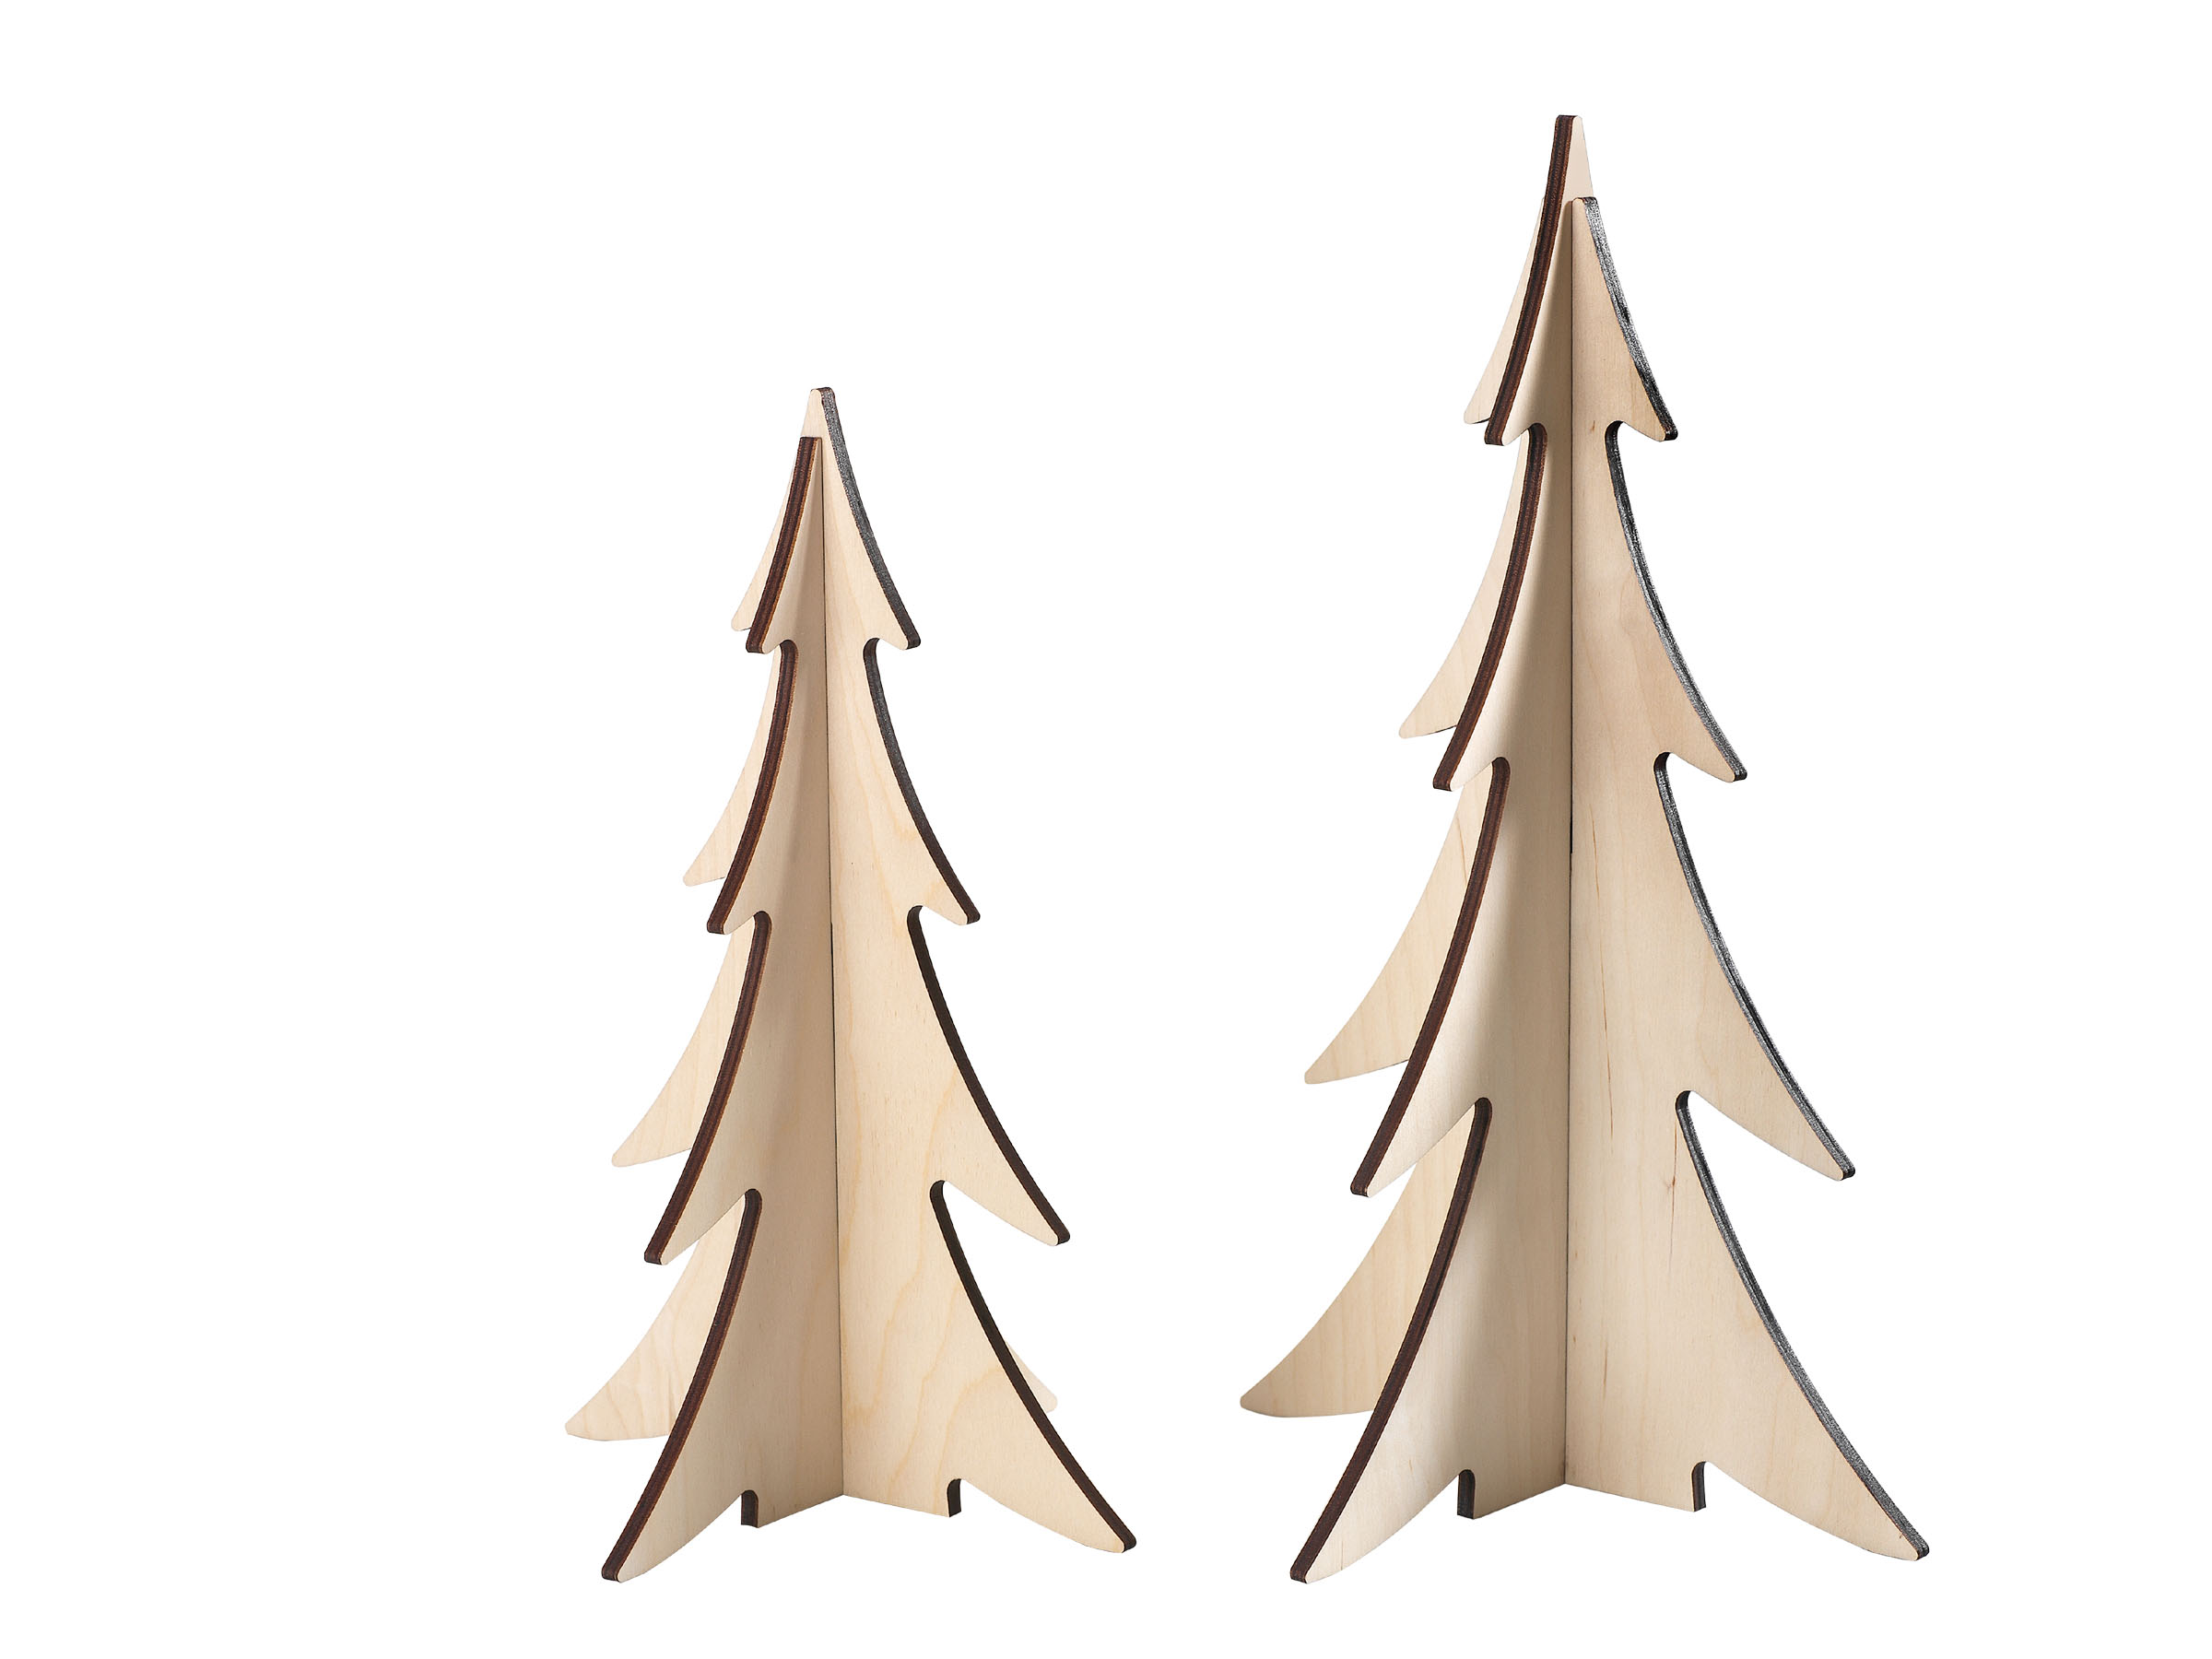 weihnachtsbaum holz natur set x mas 2017 new deko. Black Bedroom Furniture Sets. Home Design Ideas